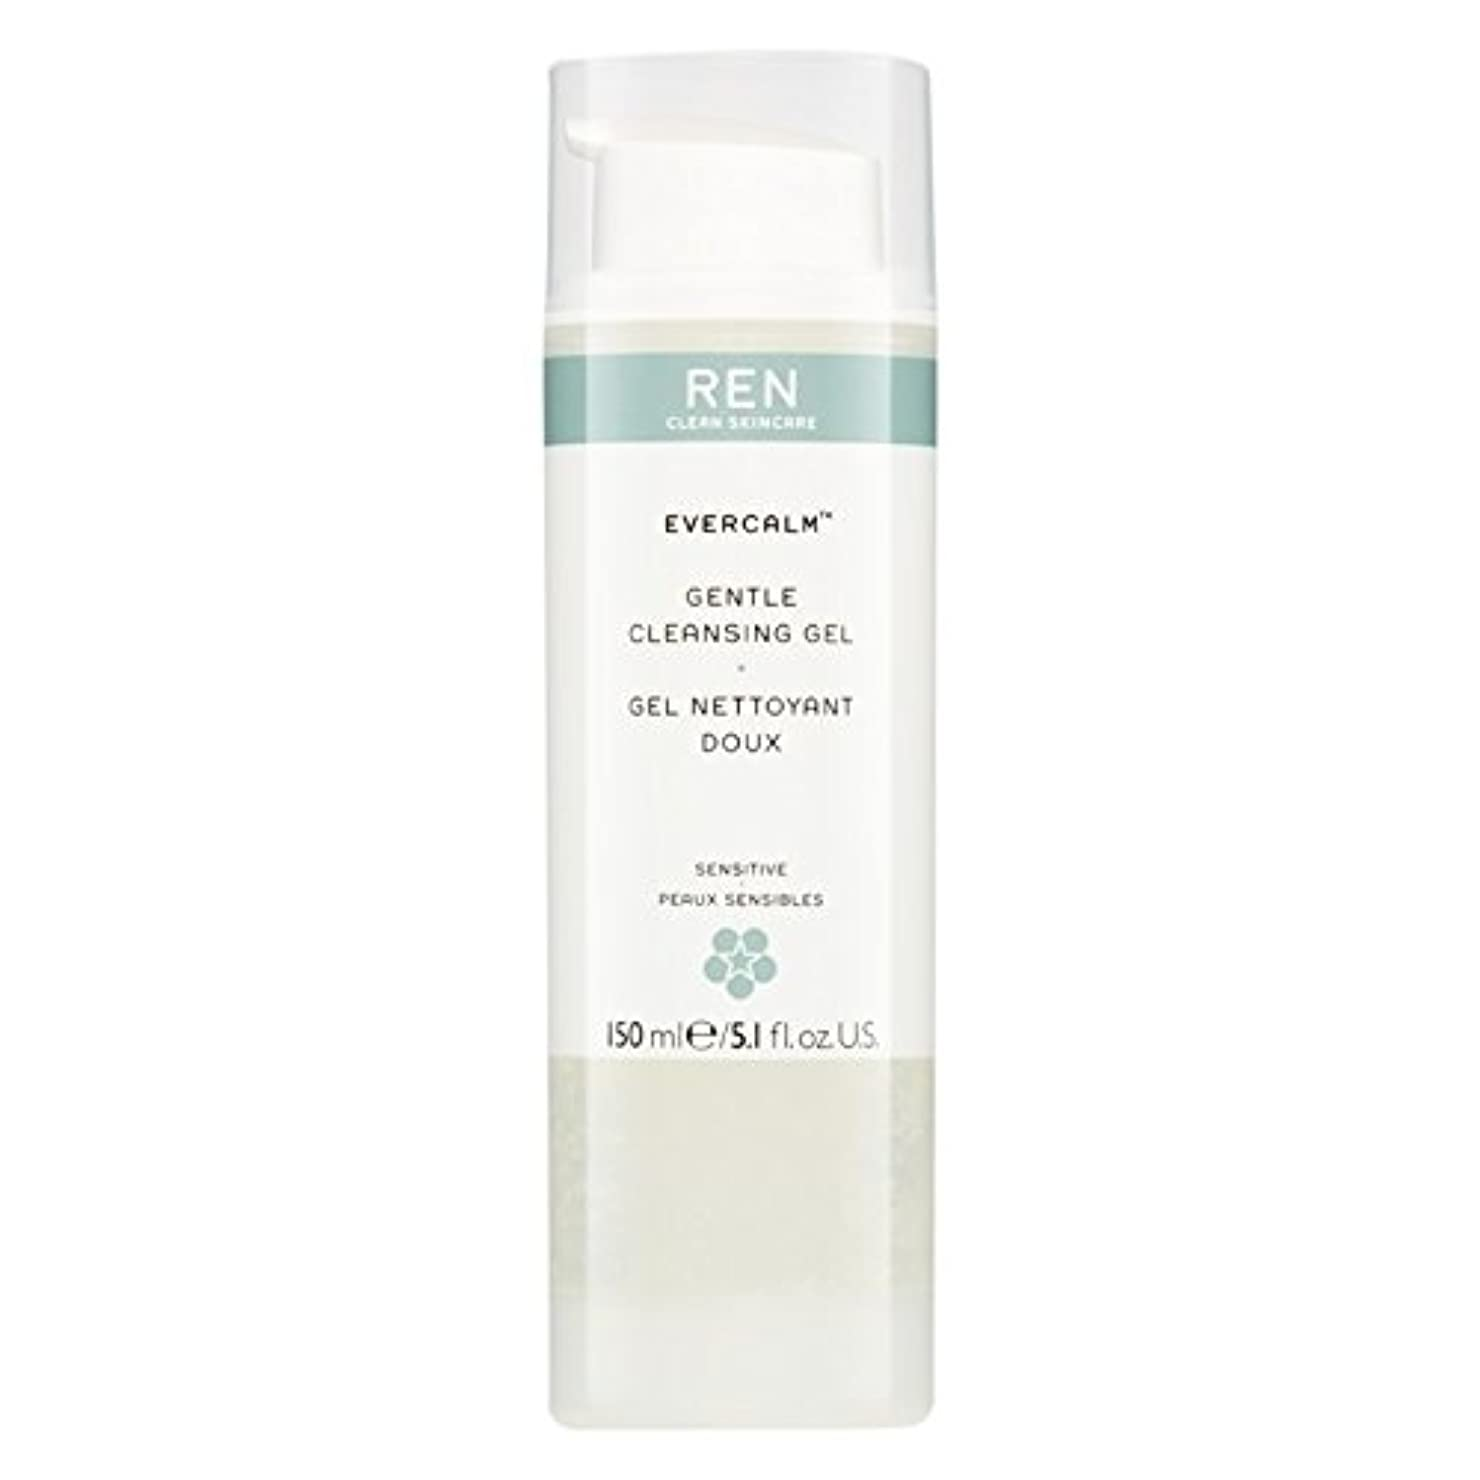 Ren Evercalm優しいクレンジングジェル、150ミリリットル (REN) (x2) - REN Evercalm Gentle Cleansing Gel, 150ml (Pack of 2) [並行輸入品]